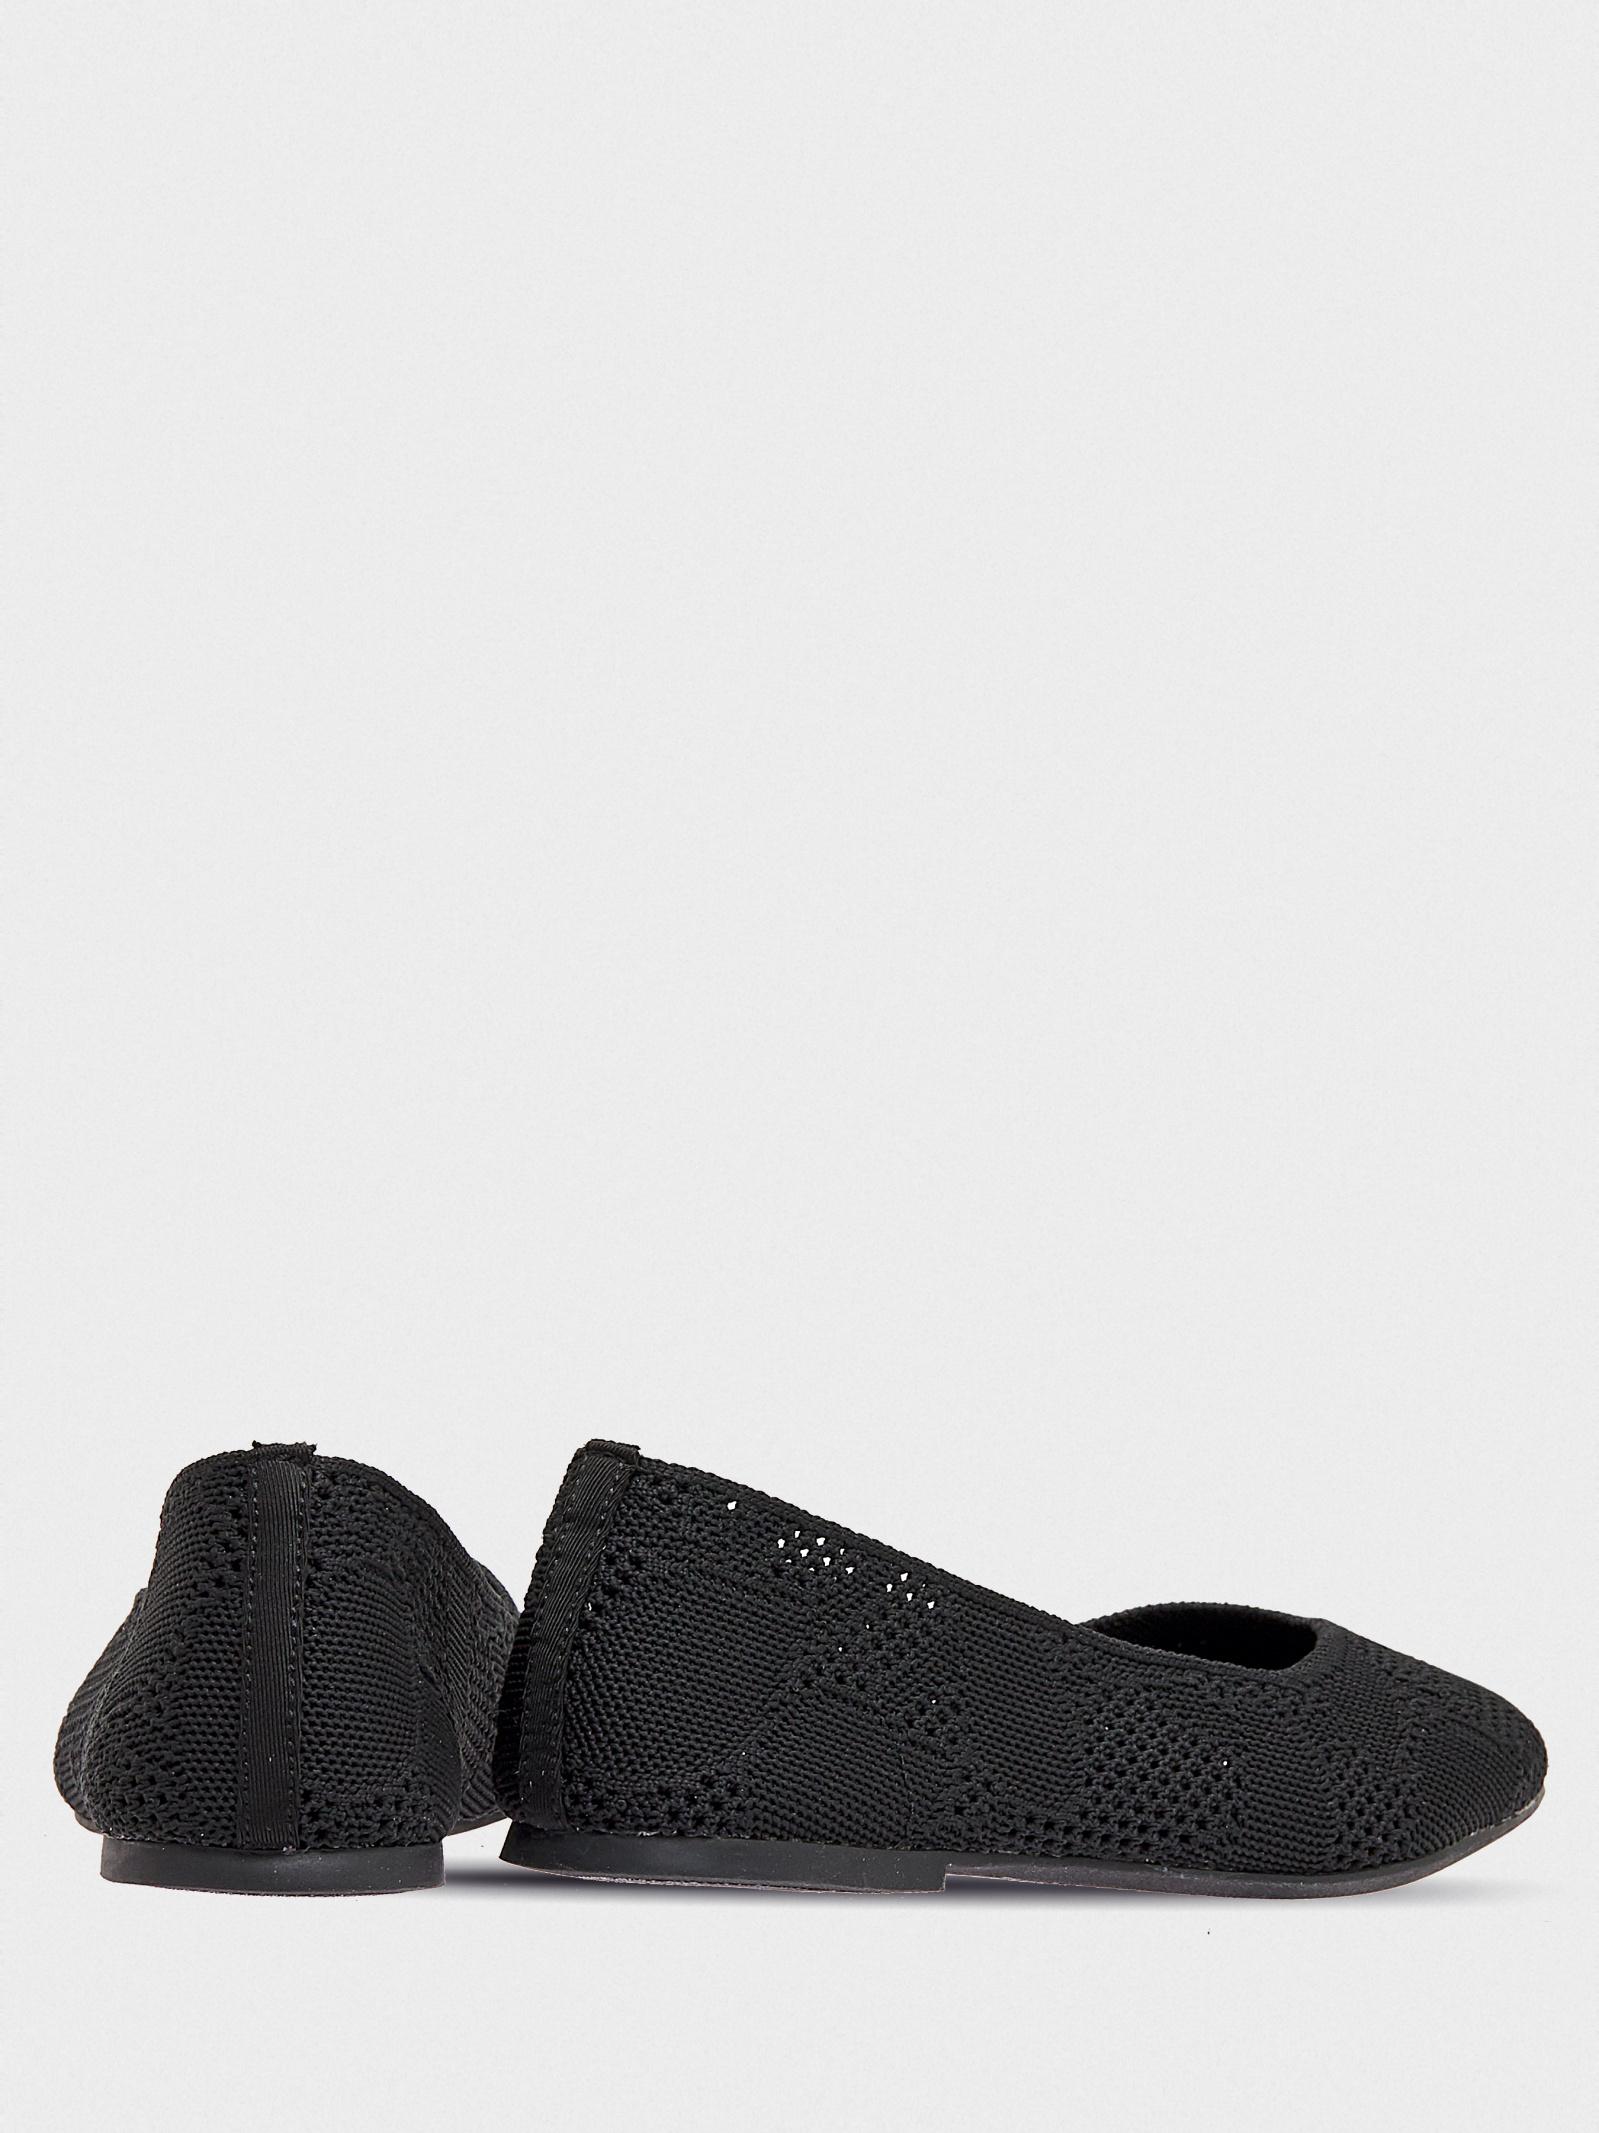 Балетки  для жінок Skechers Modern Comfort 158019 BLK модне взуття, 2017